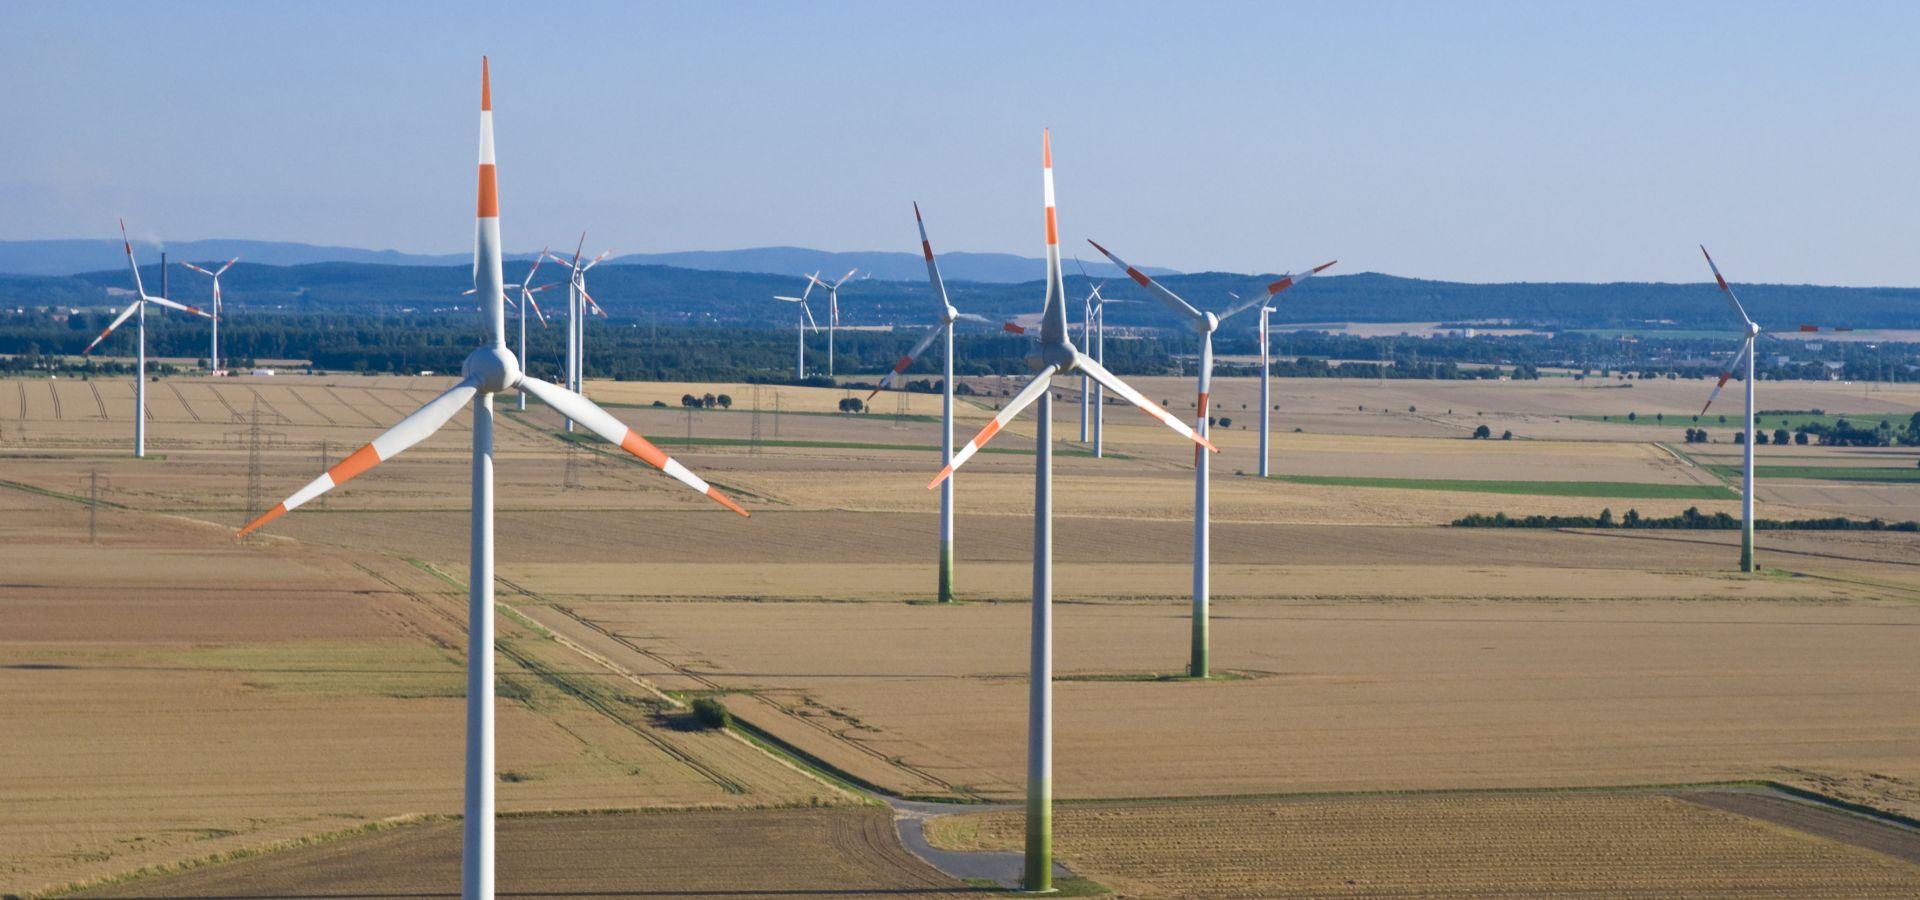 A onshore wind farm in Lower Saxony, Germany